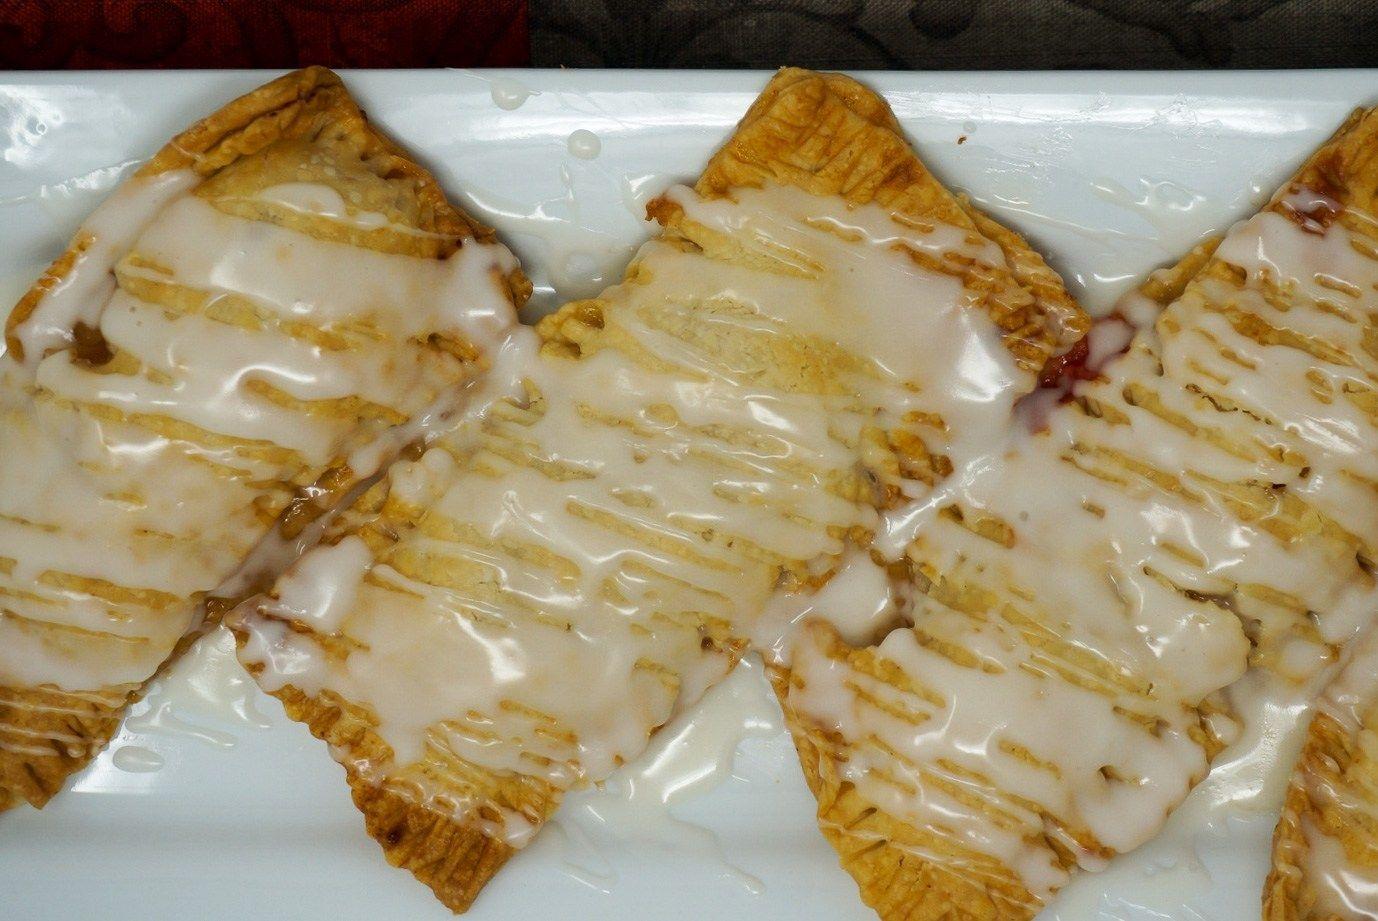 Air Fryer Fruit Pies Recipe Air fryer recipes, Fruit